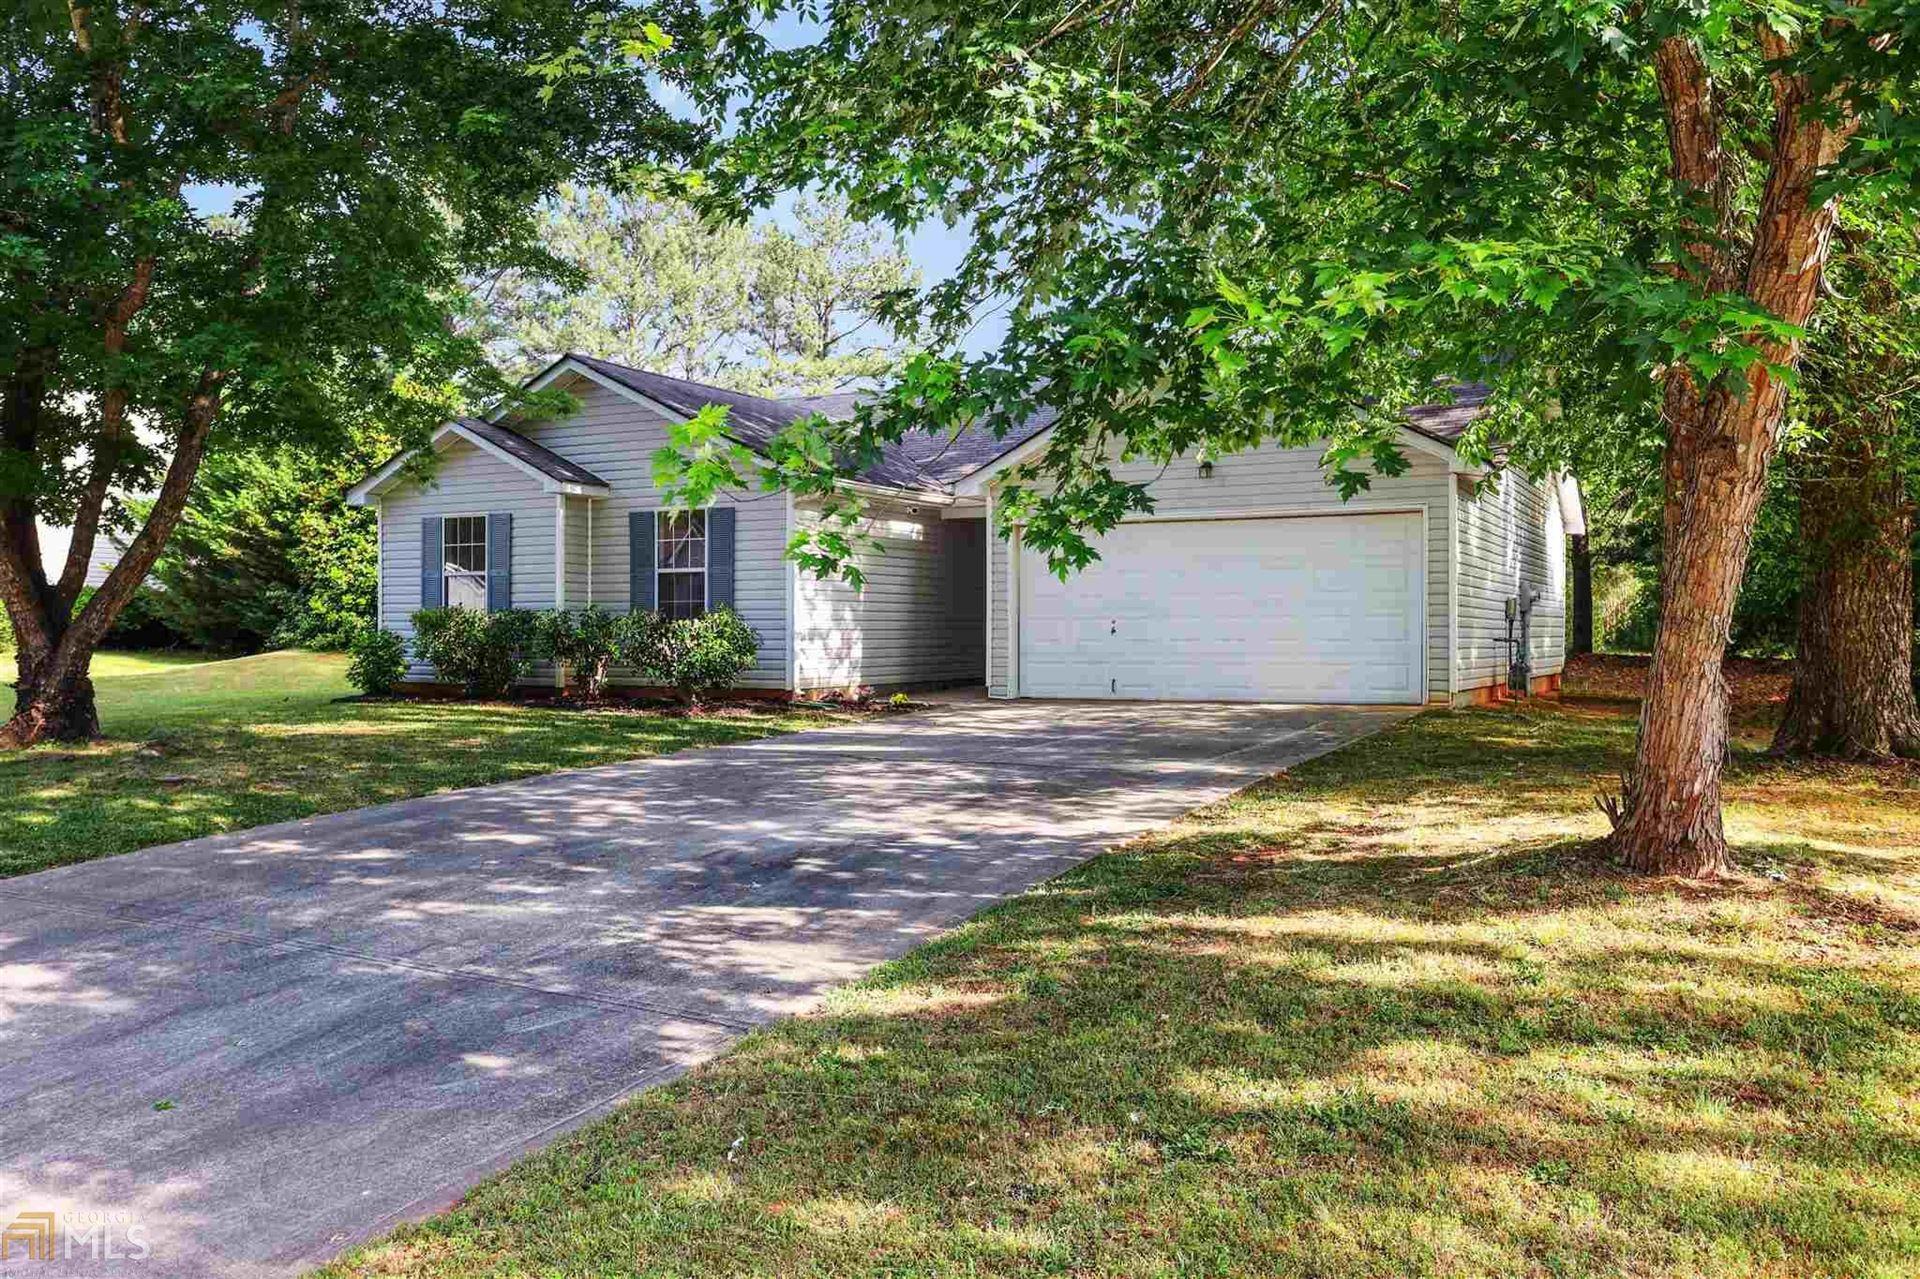 6750 Manor Creek Dr, Douglasville, GA 30135 - #: 8980964